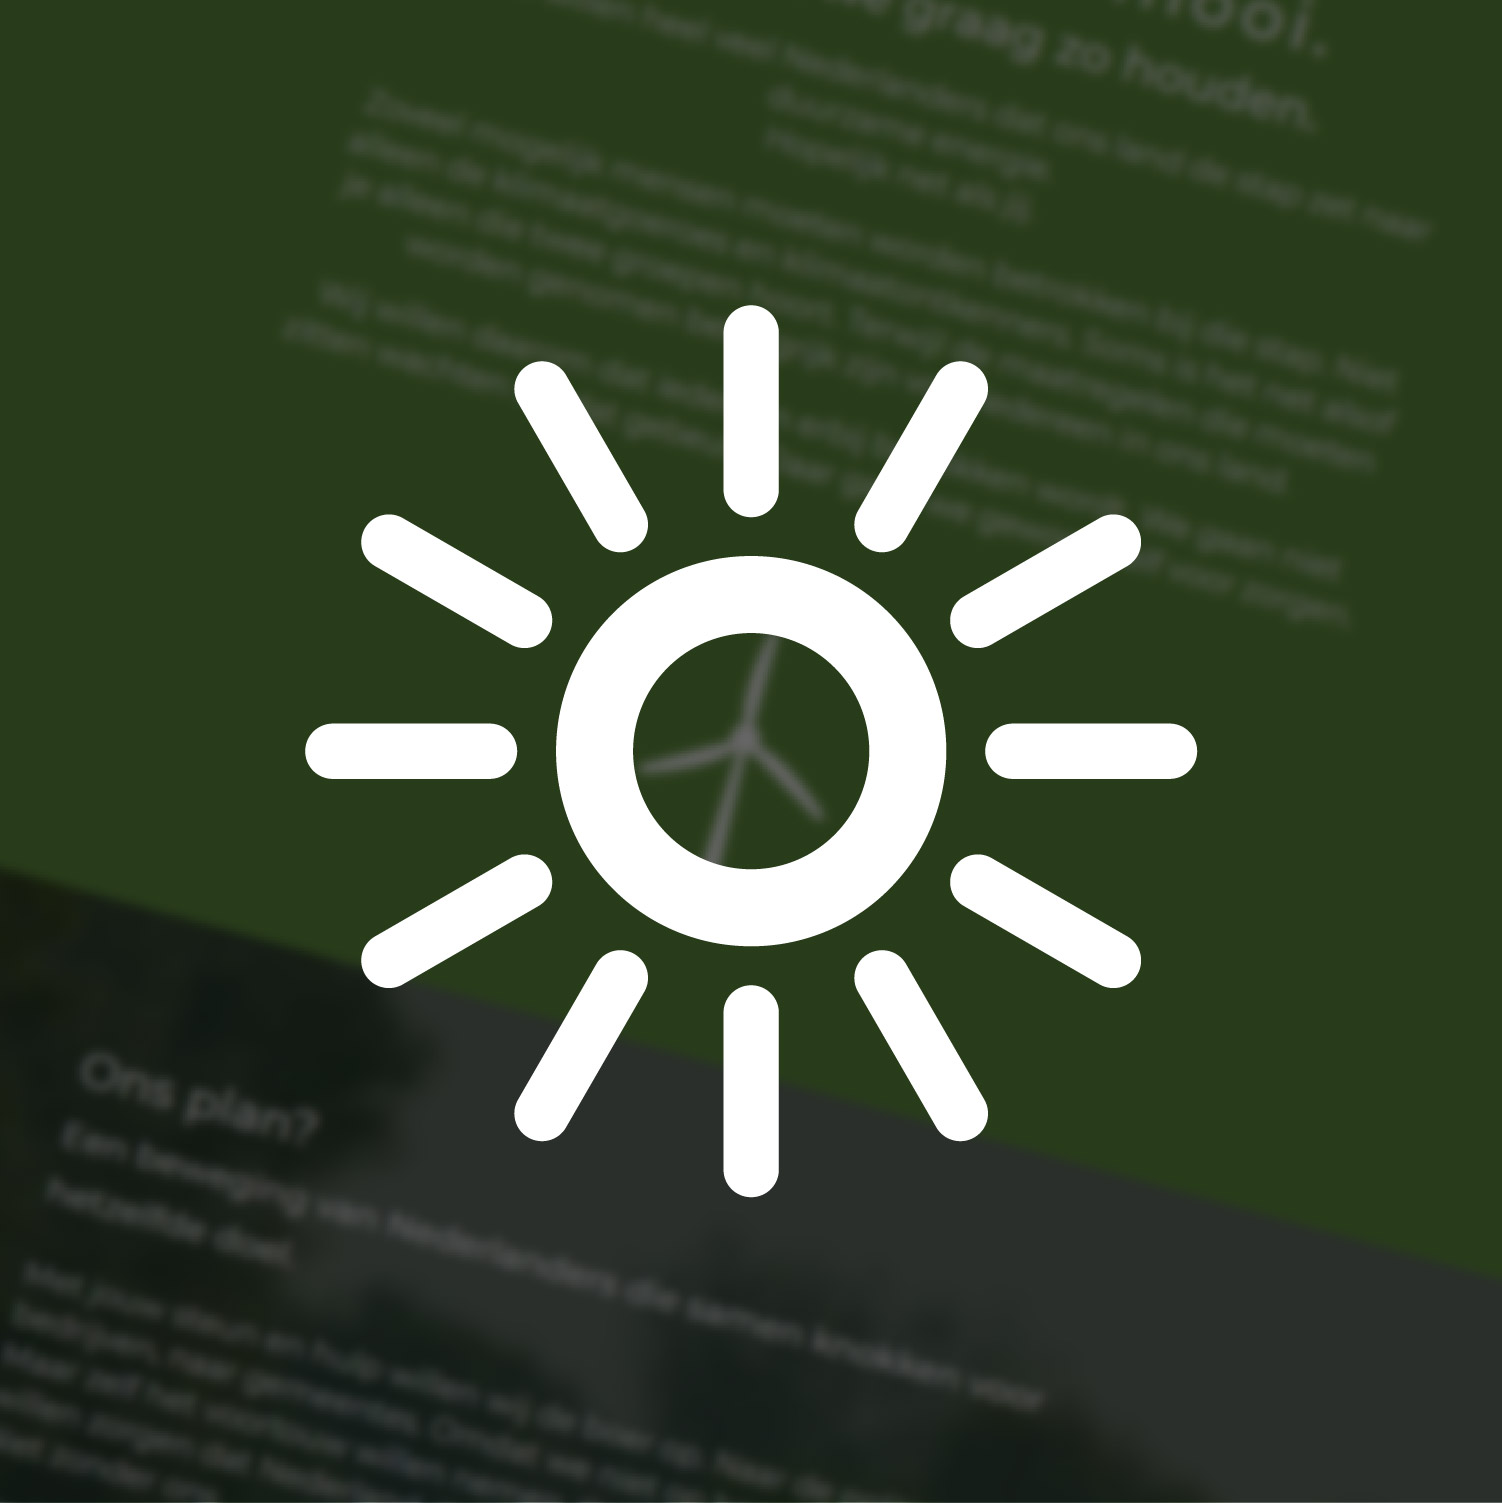 Kies nieuwe energie   Website voor Duurzaamheidscampagne